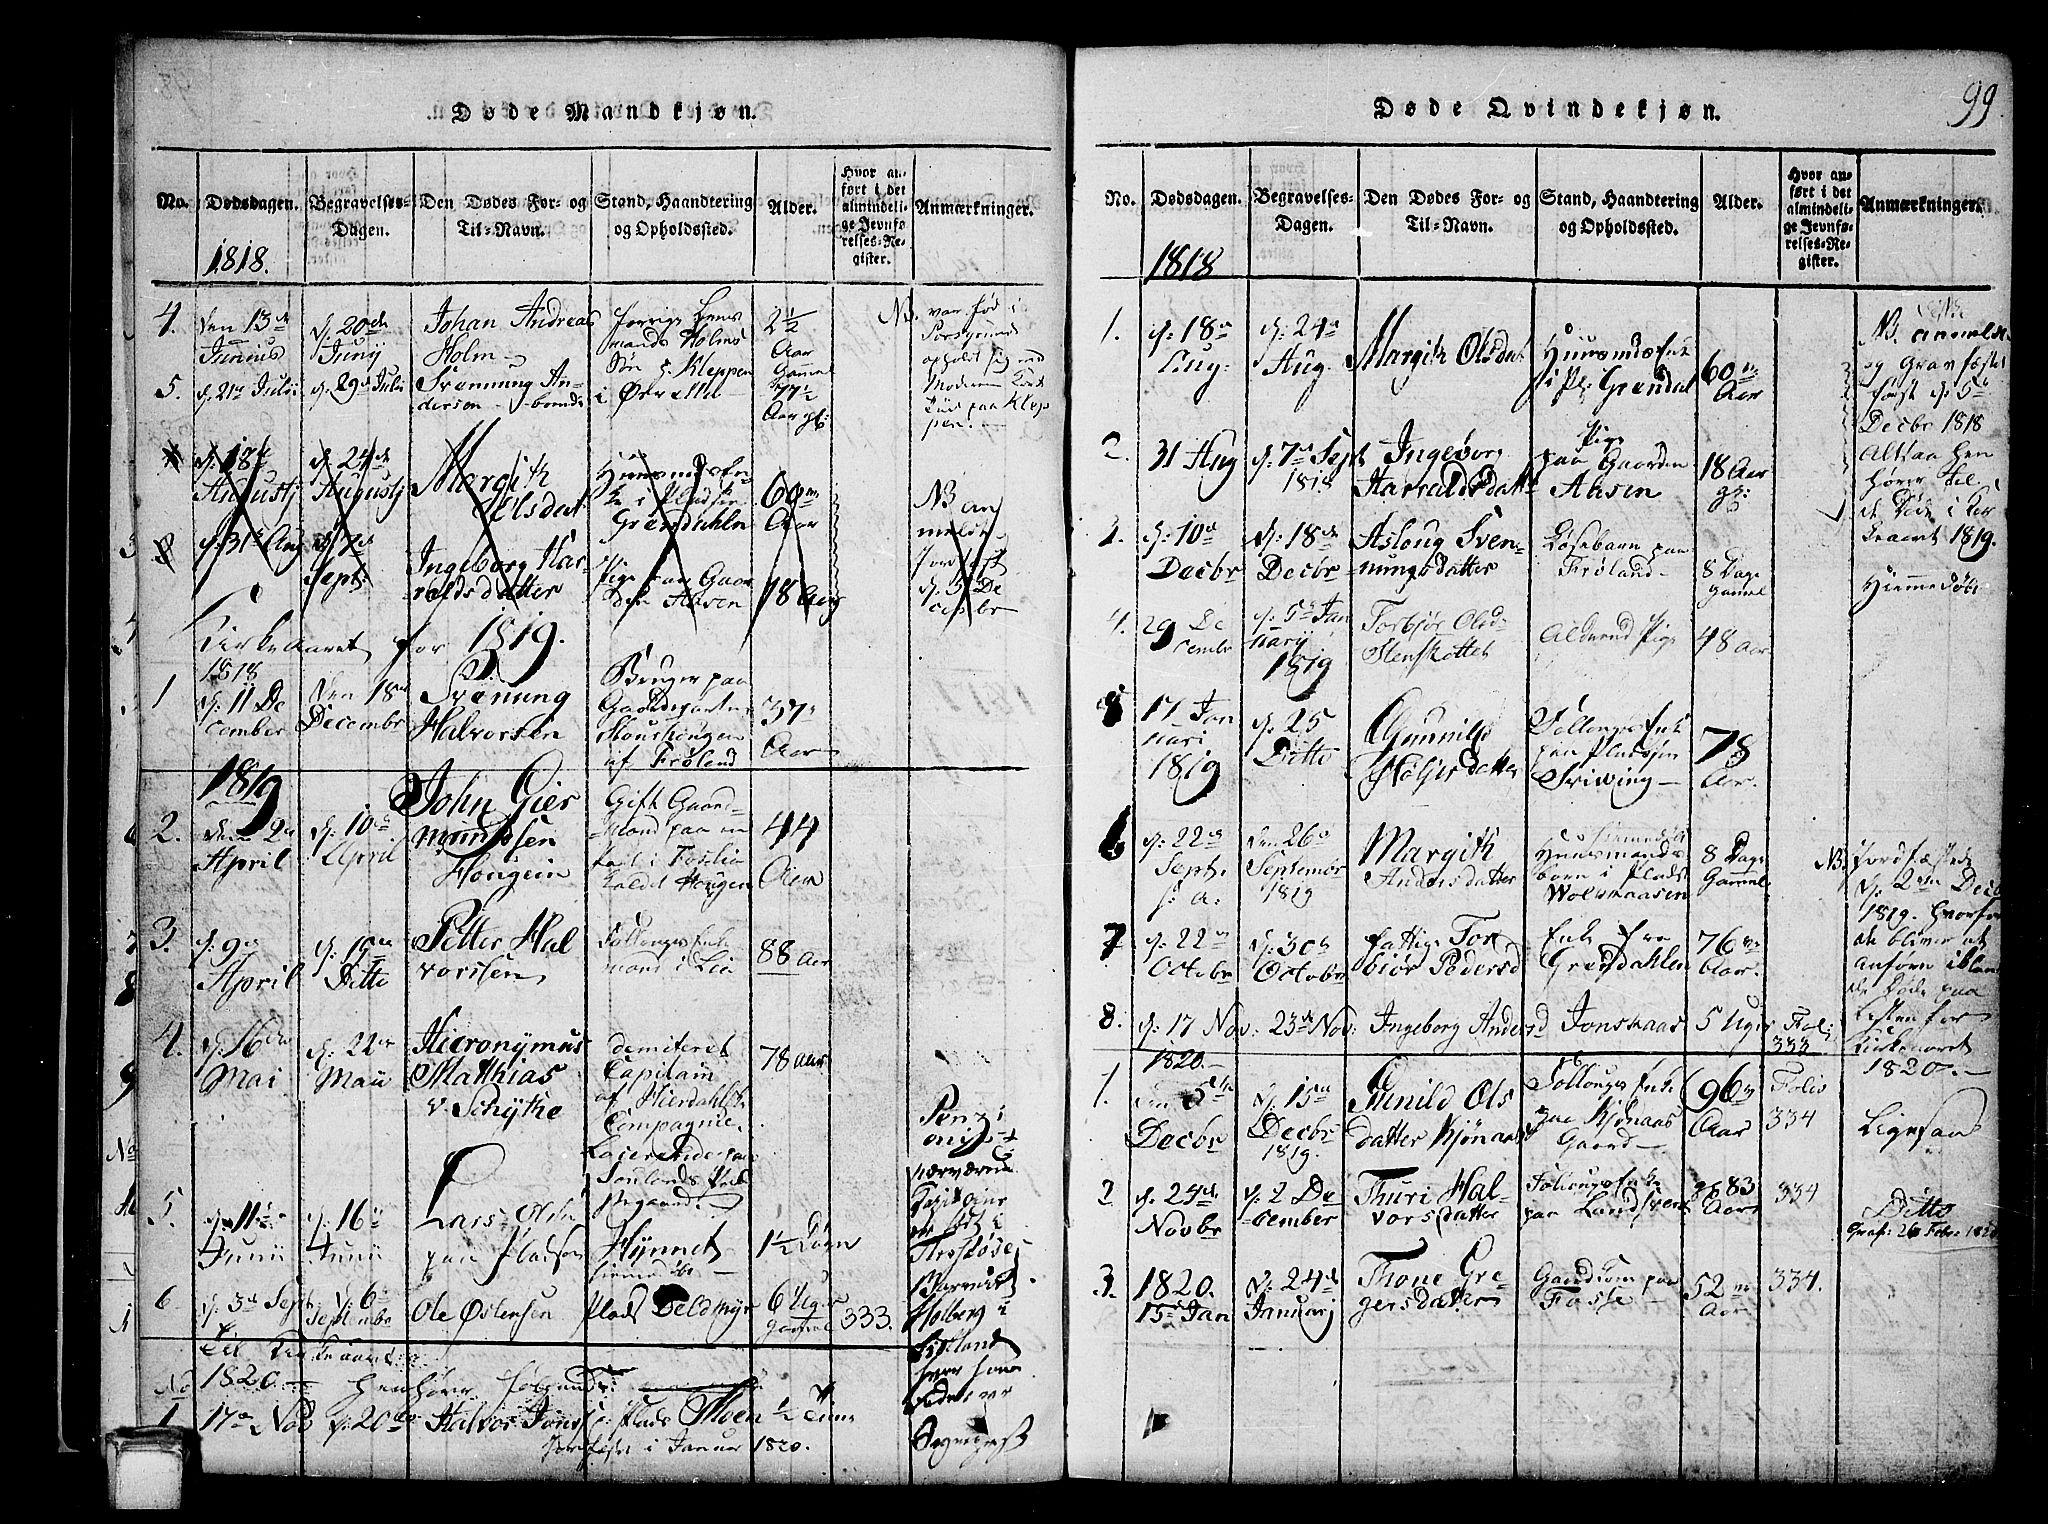 SAKO, Hjartdal kirkebøker, G/Gb/L0001: Klokkerbok nr. II 1, 1815-1842, s. 99